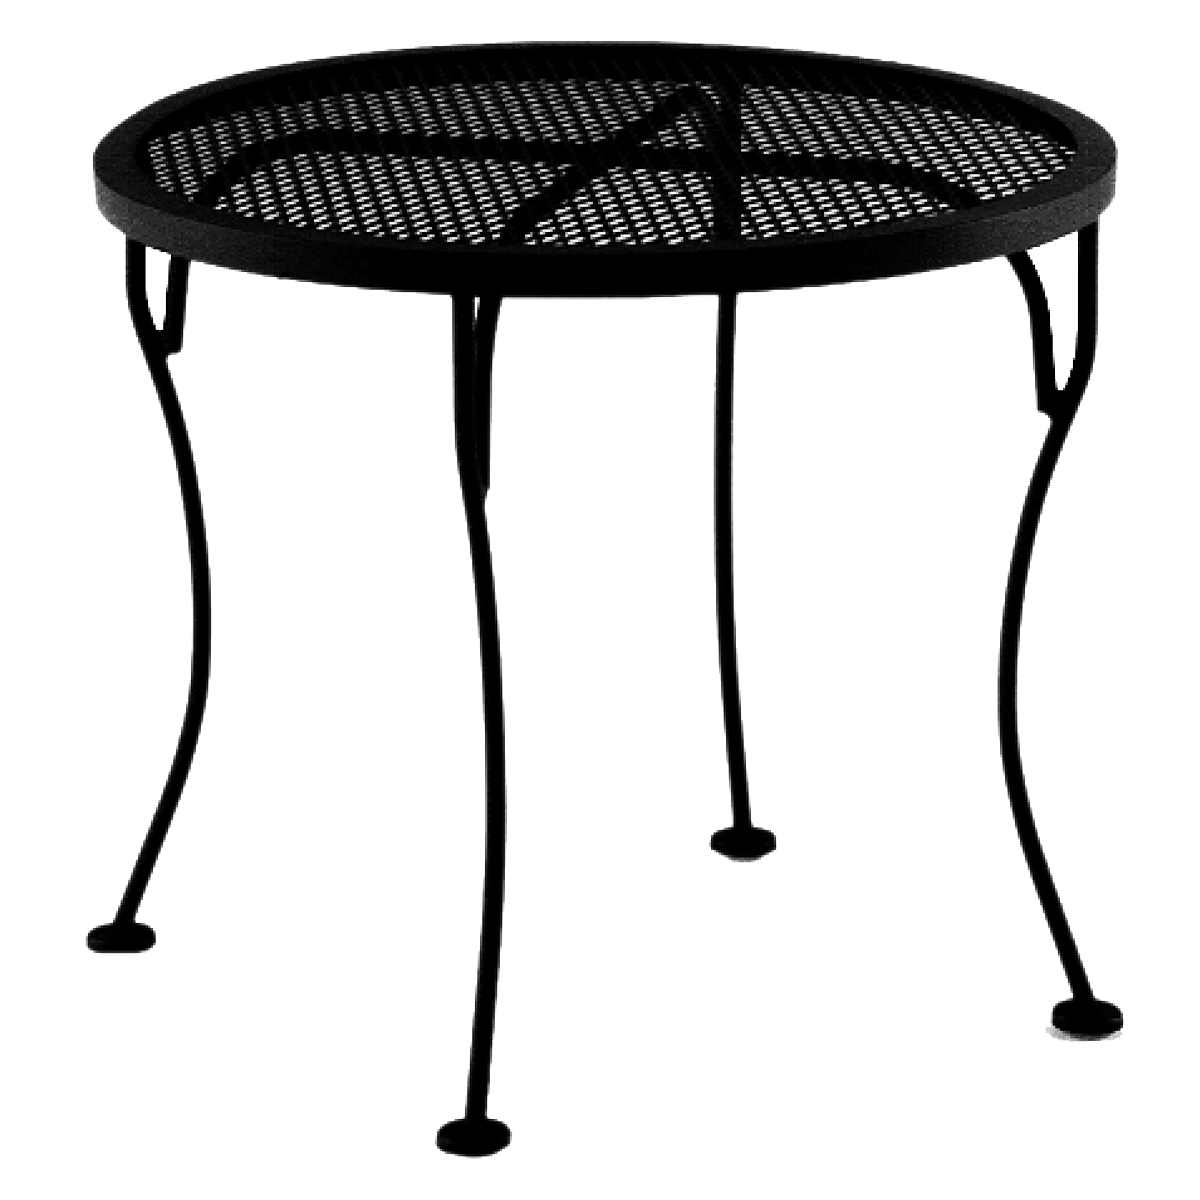 Micro Mesh Top Iron Tables